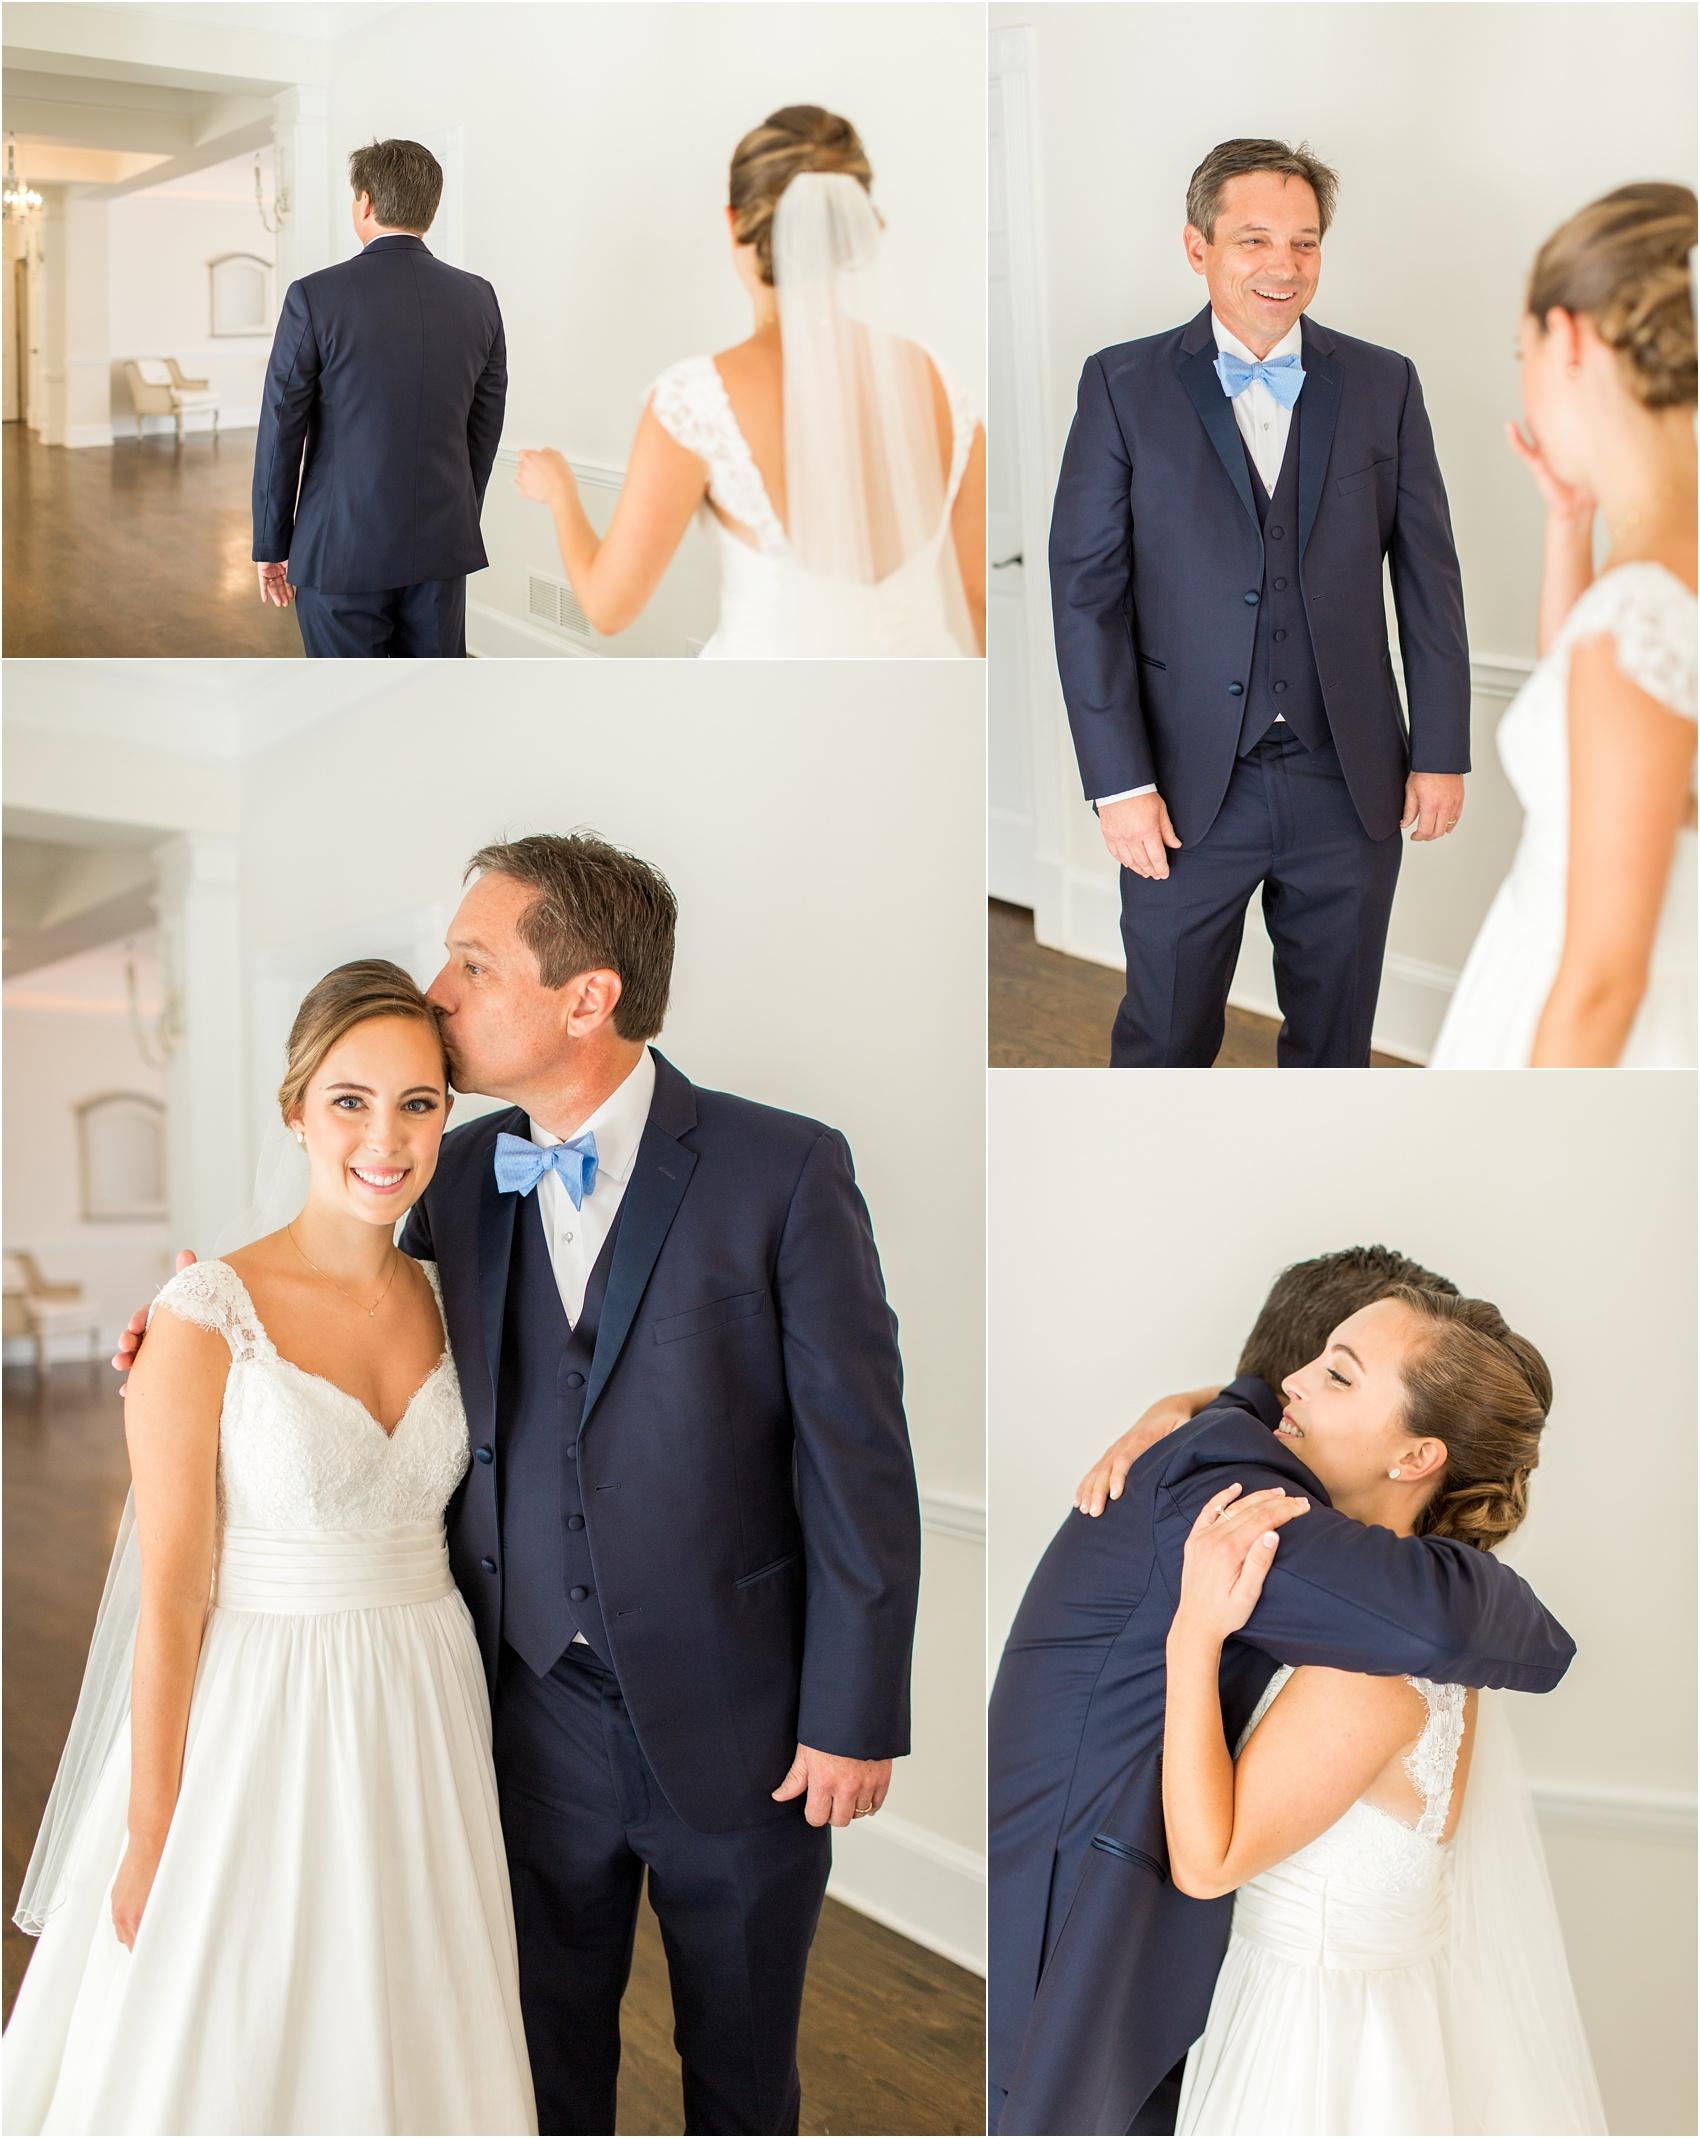 Savannah Eve Photography- Sigl-Adams Wedding- Sneak Peek-13.jpg